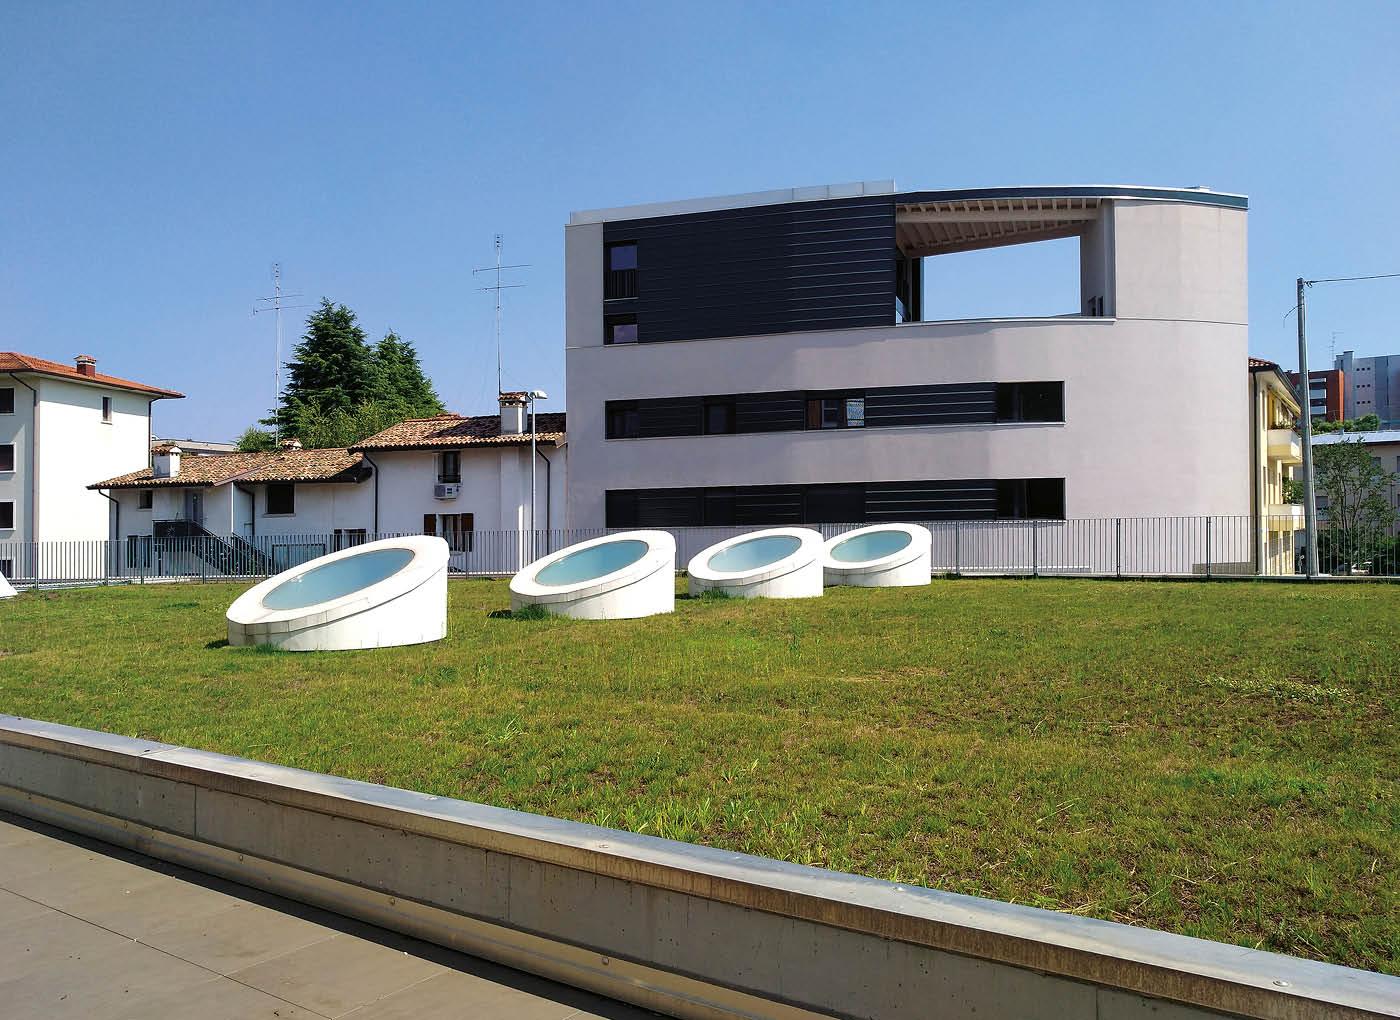 ospedale-pordenone-tetto-verde-lecagreen-2